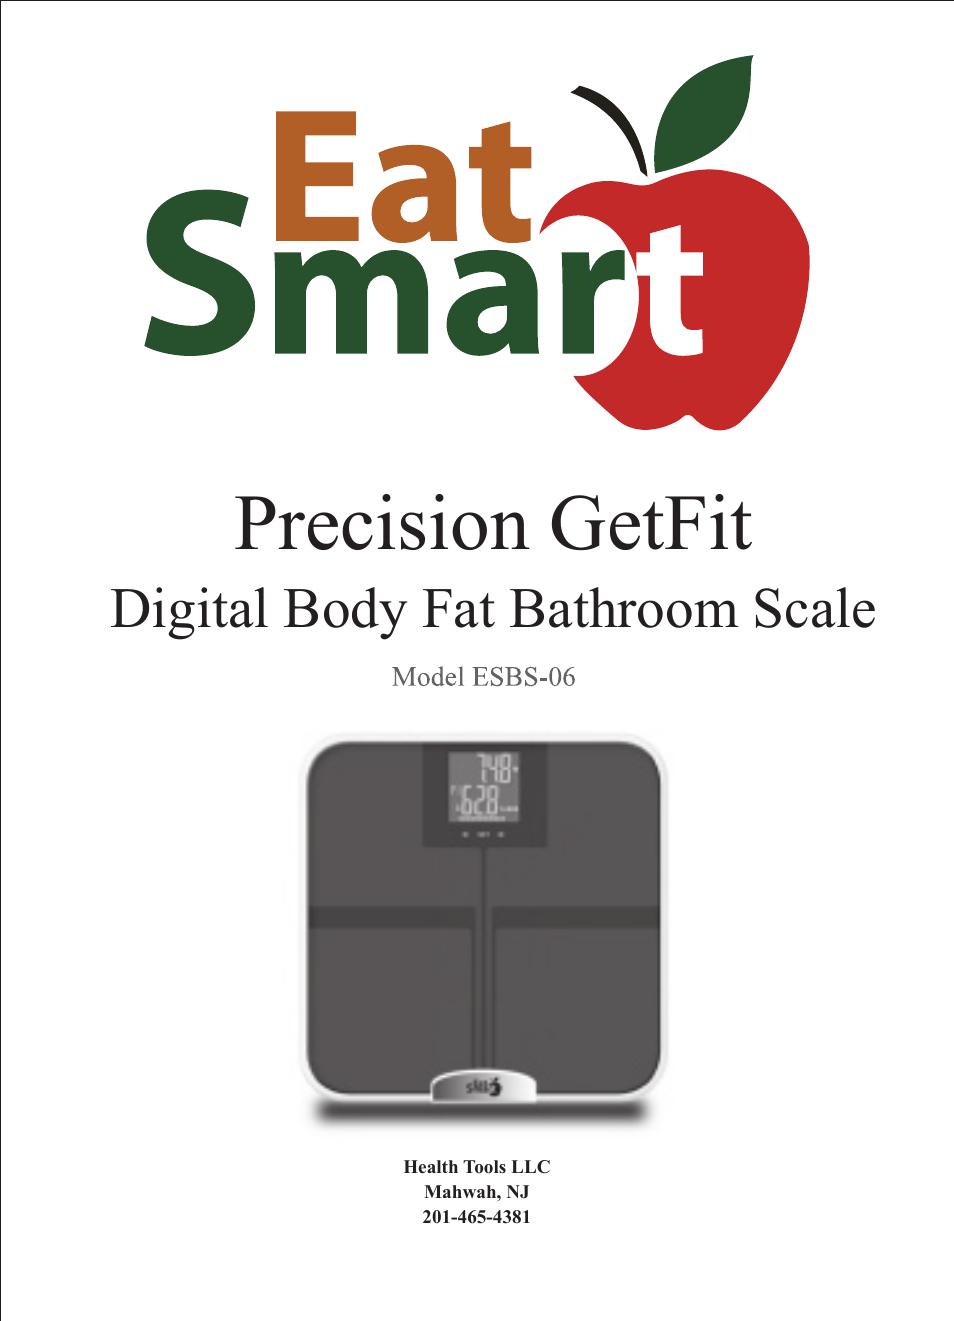 Product spotlight meet the eatsmart precision digital bathroom scale - Product Spotlight Meet The Eatsmart Precision Digital Bathroom Scale 12